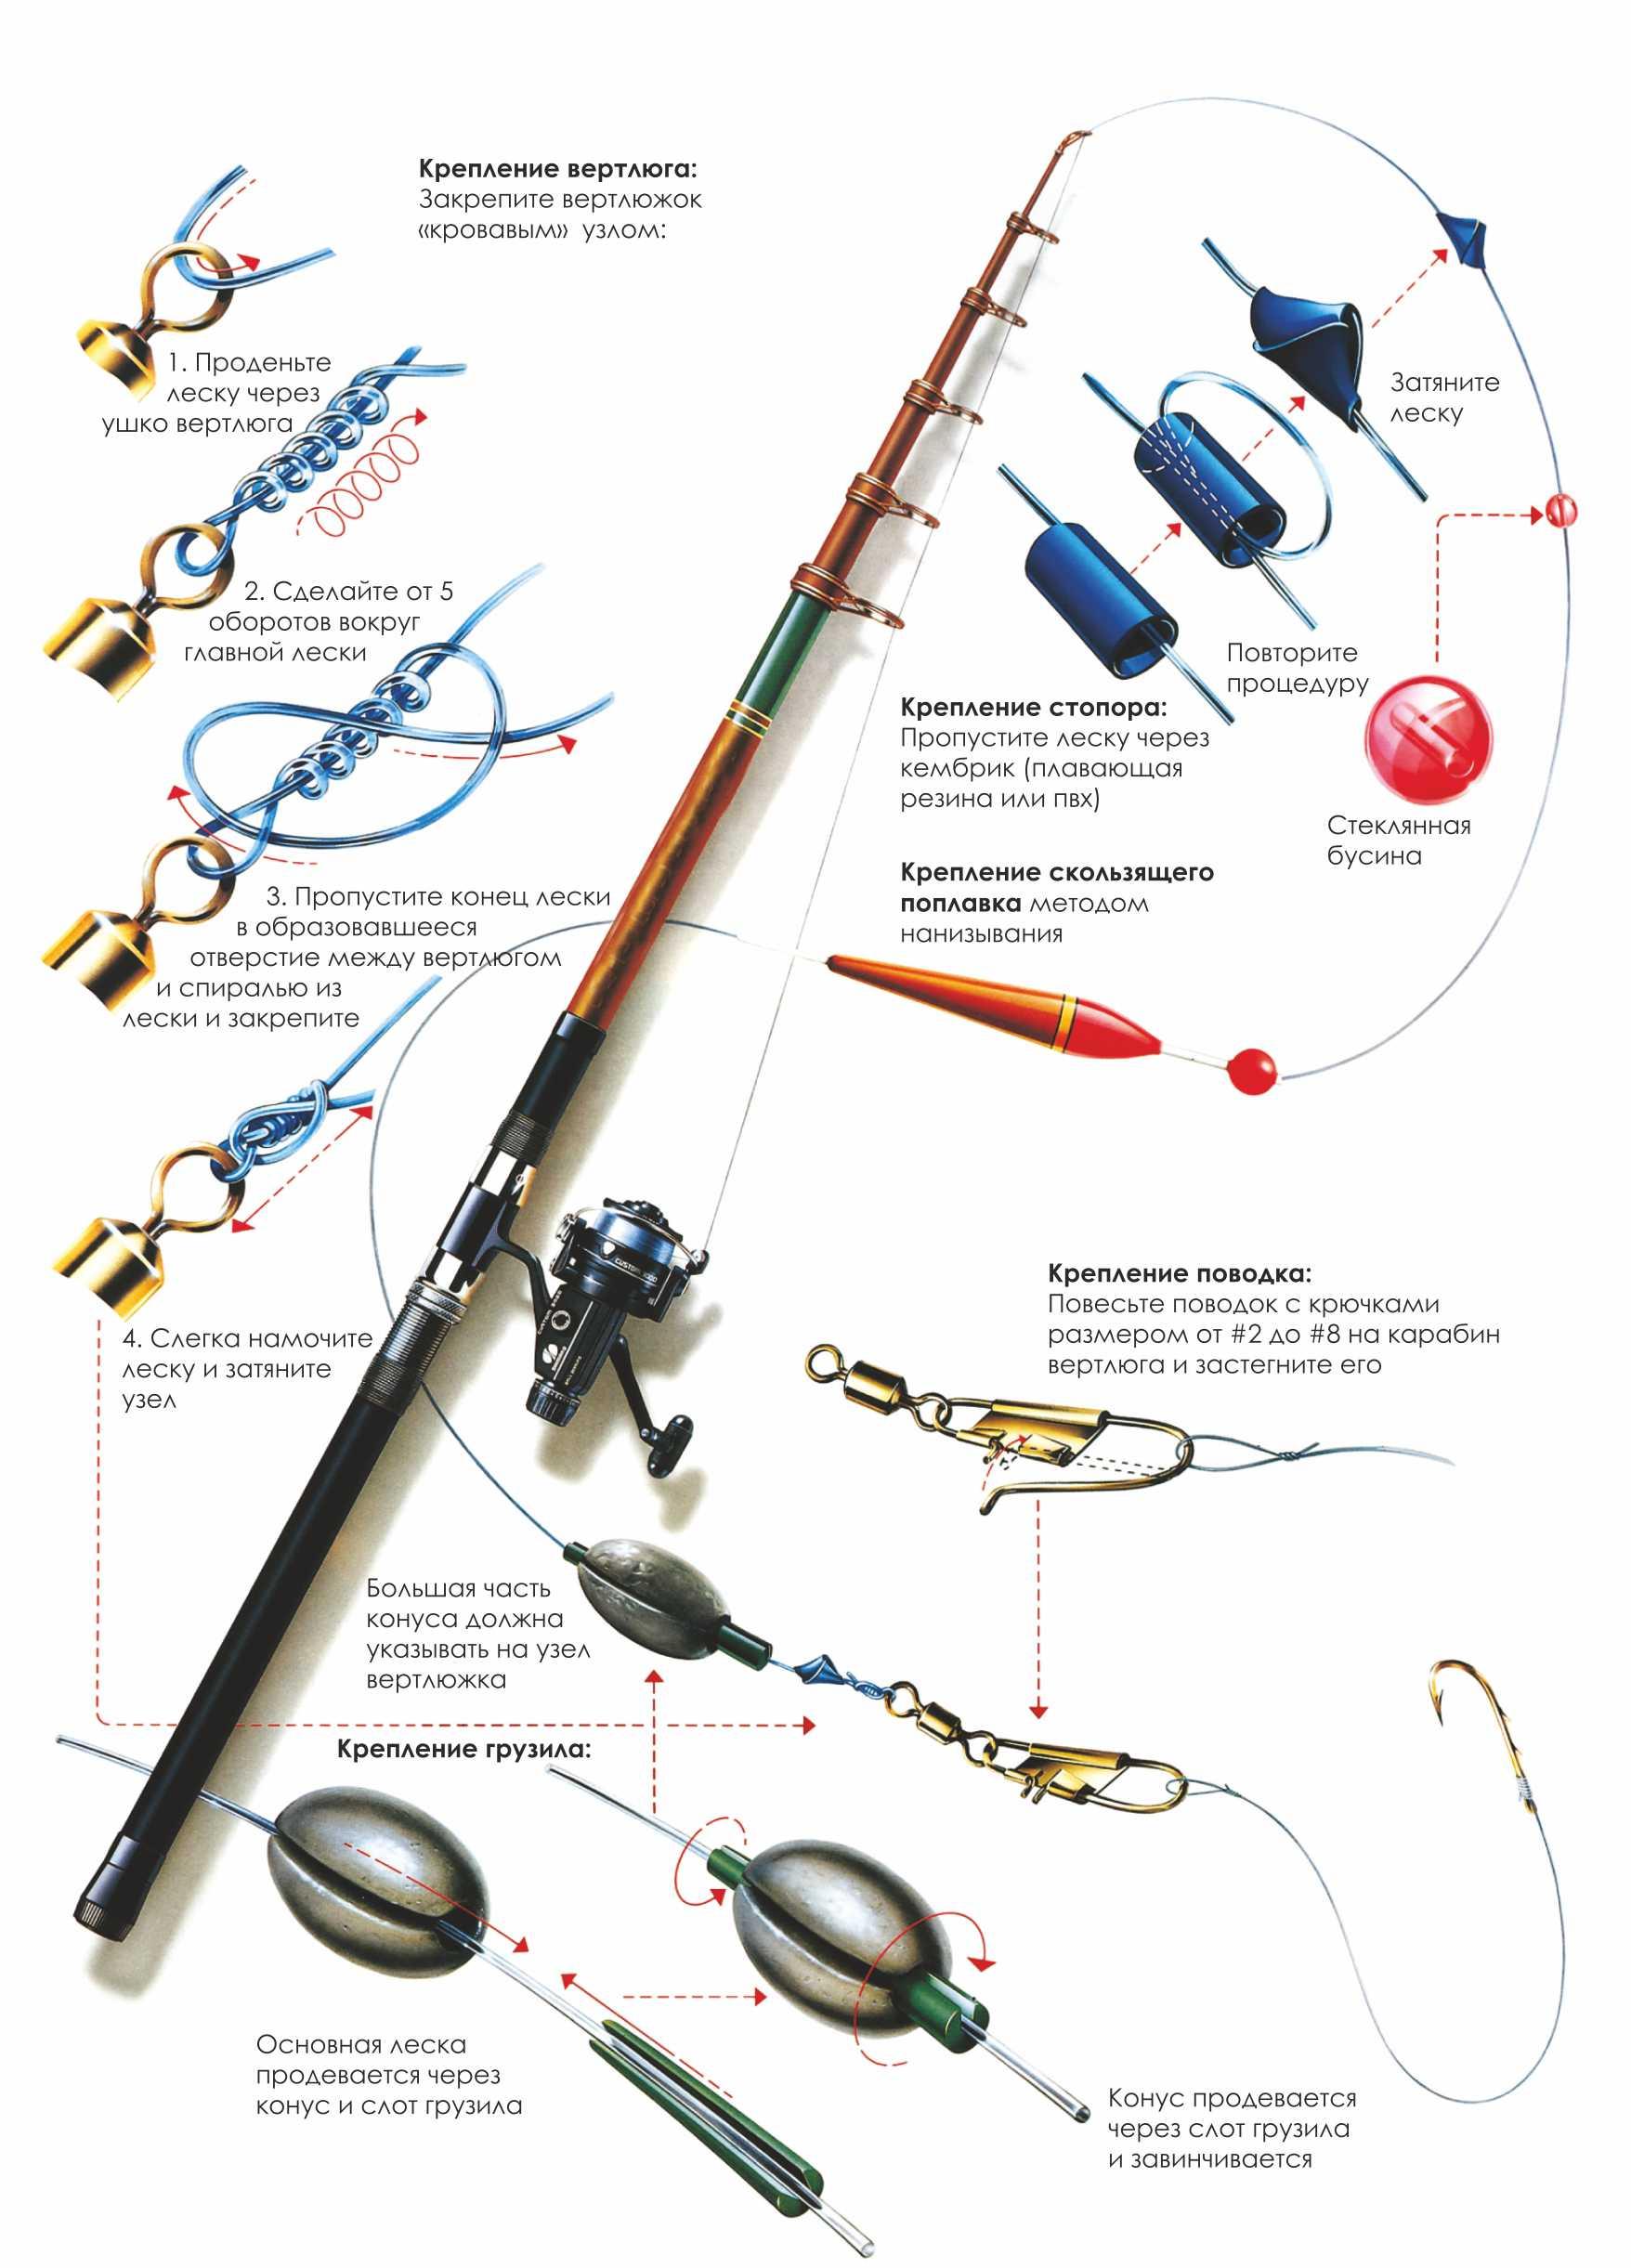 Рыбалка схема крючка лески